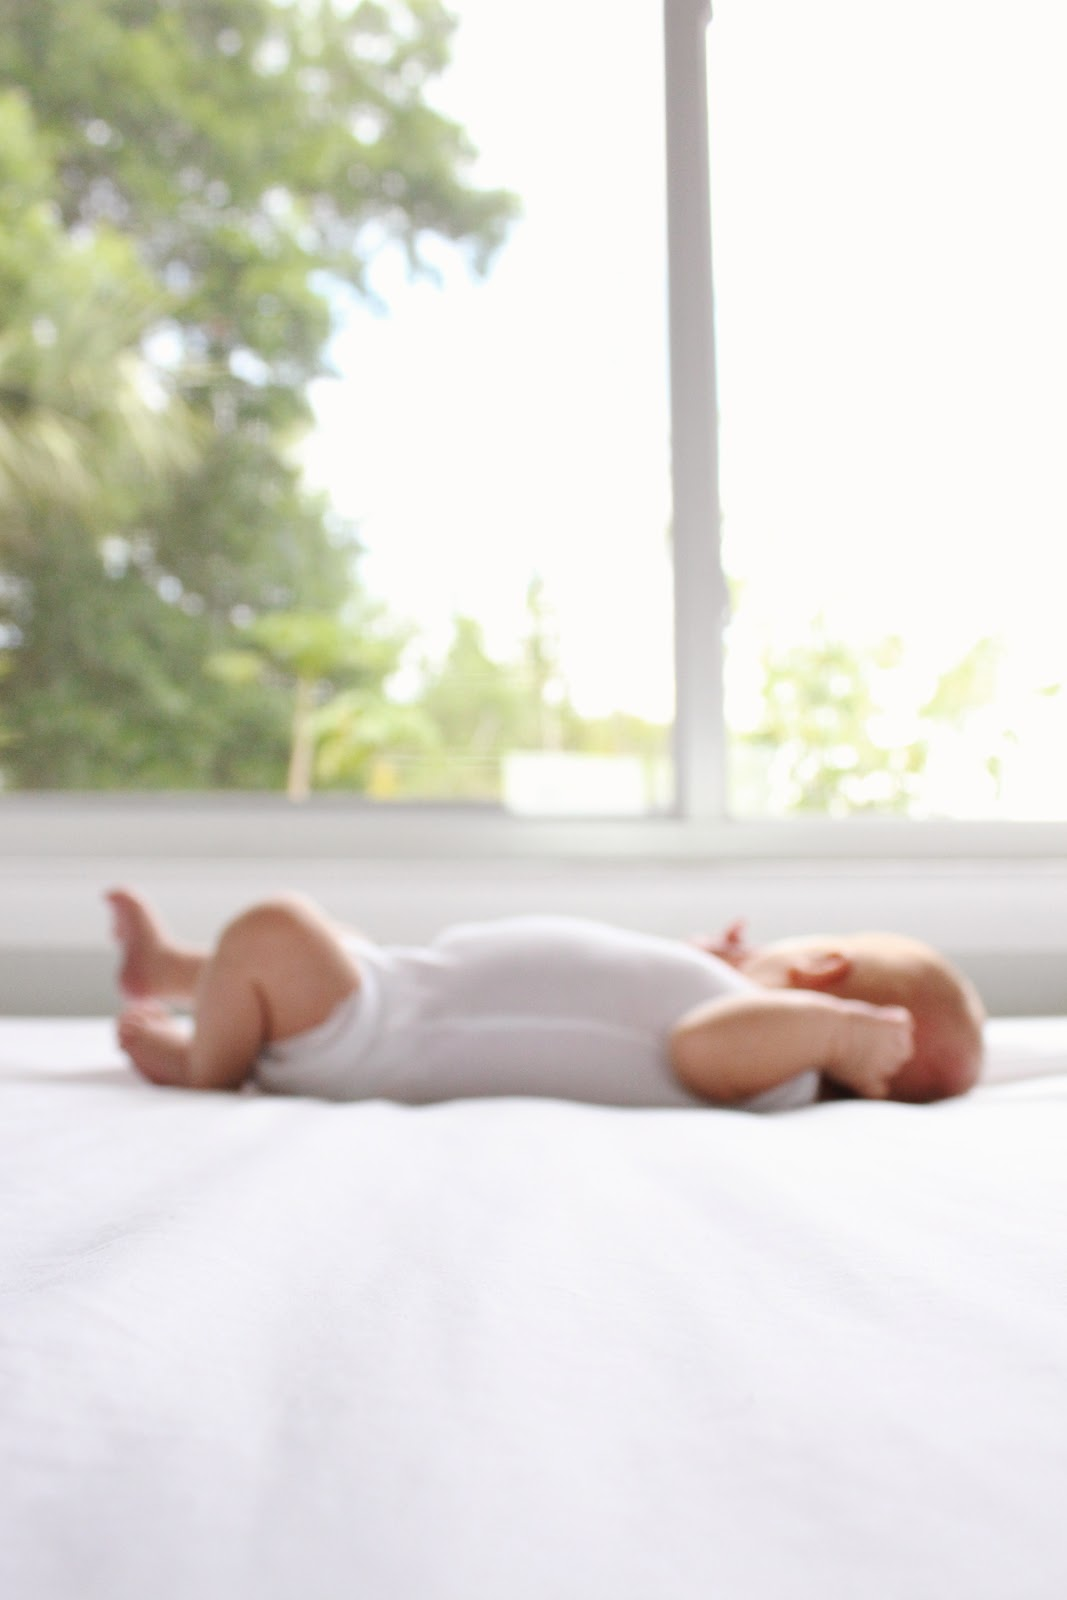 Baby Birth Story